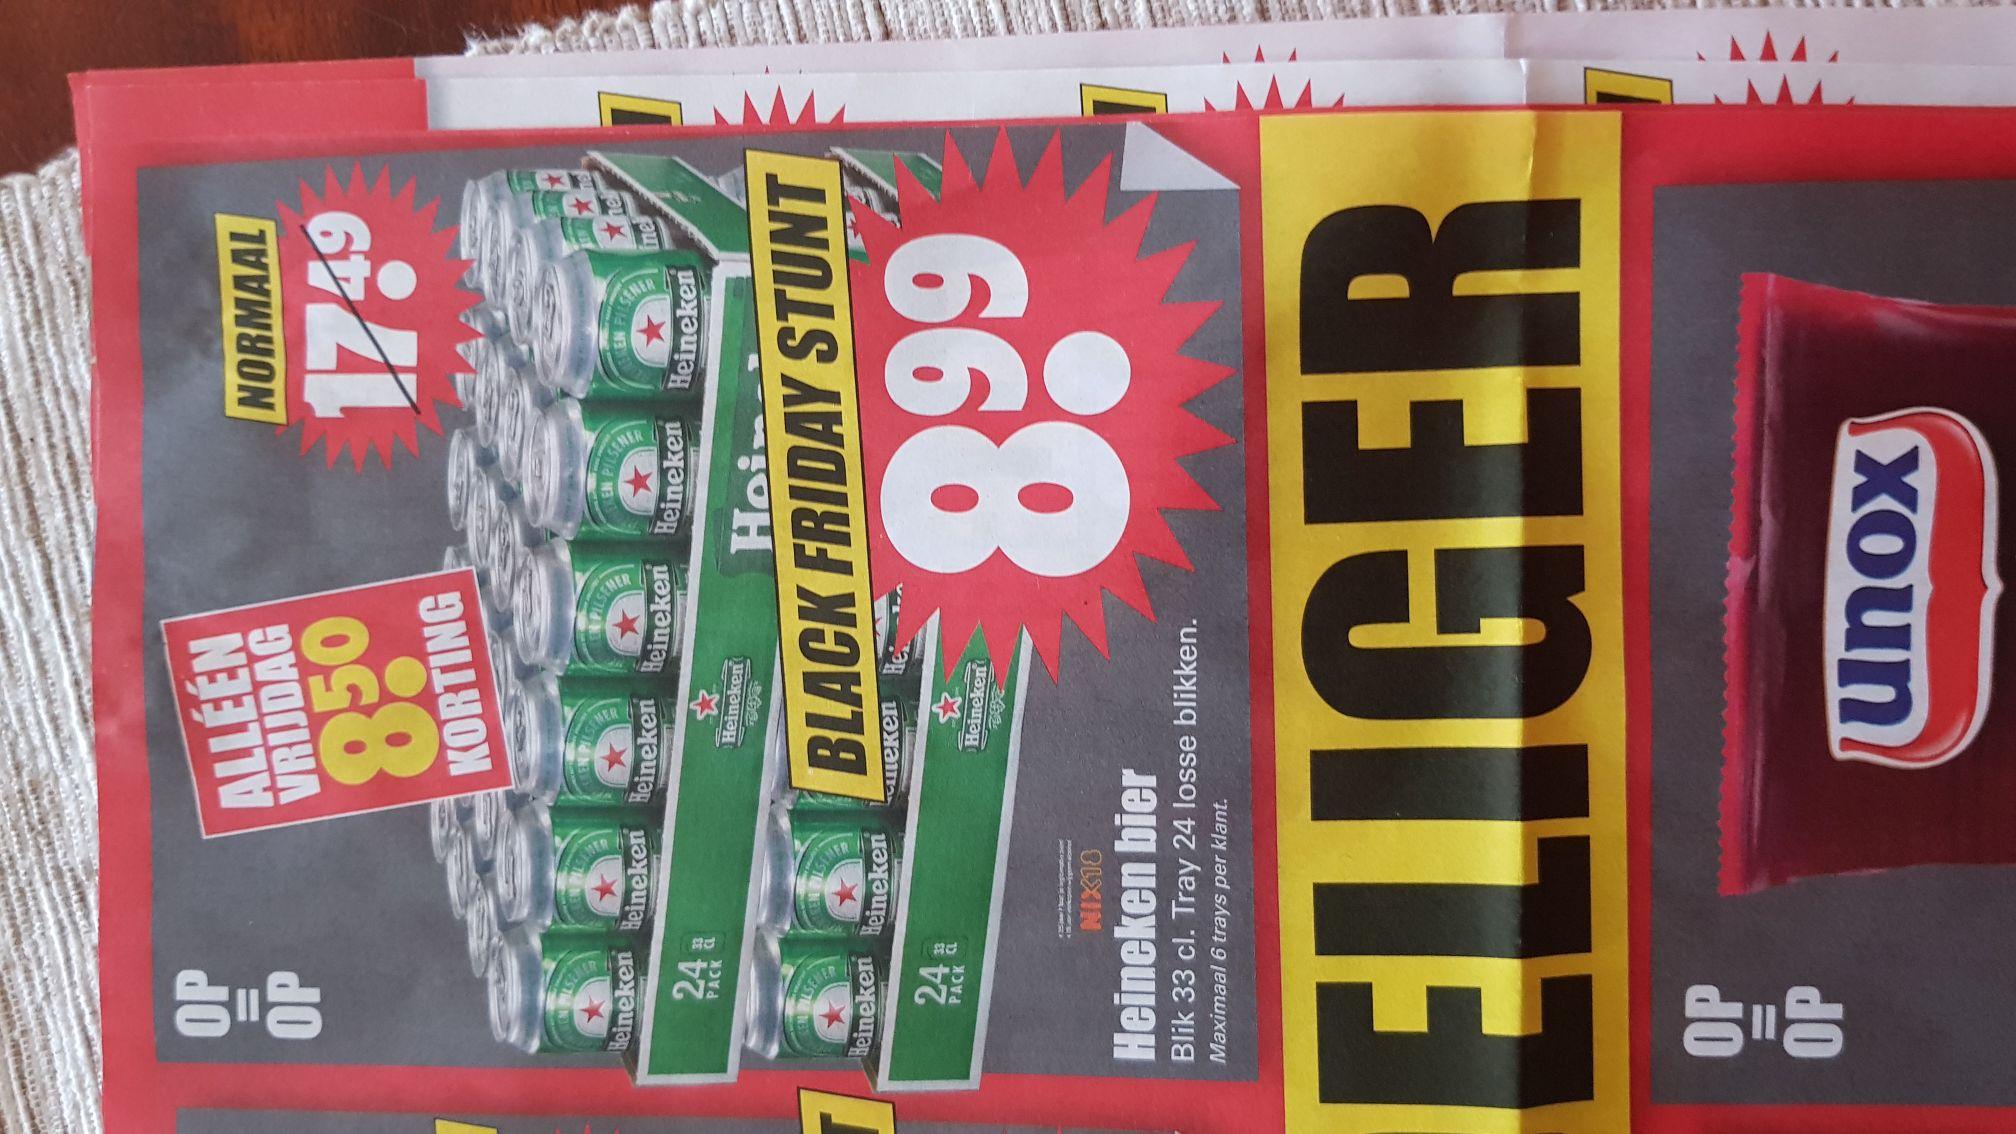 Black Friday: 24 Blikjes Heineken bier alleen vrijdag 24 november @ DIRK